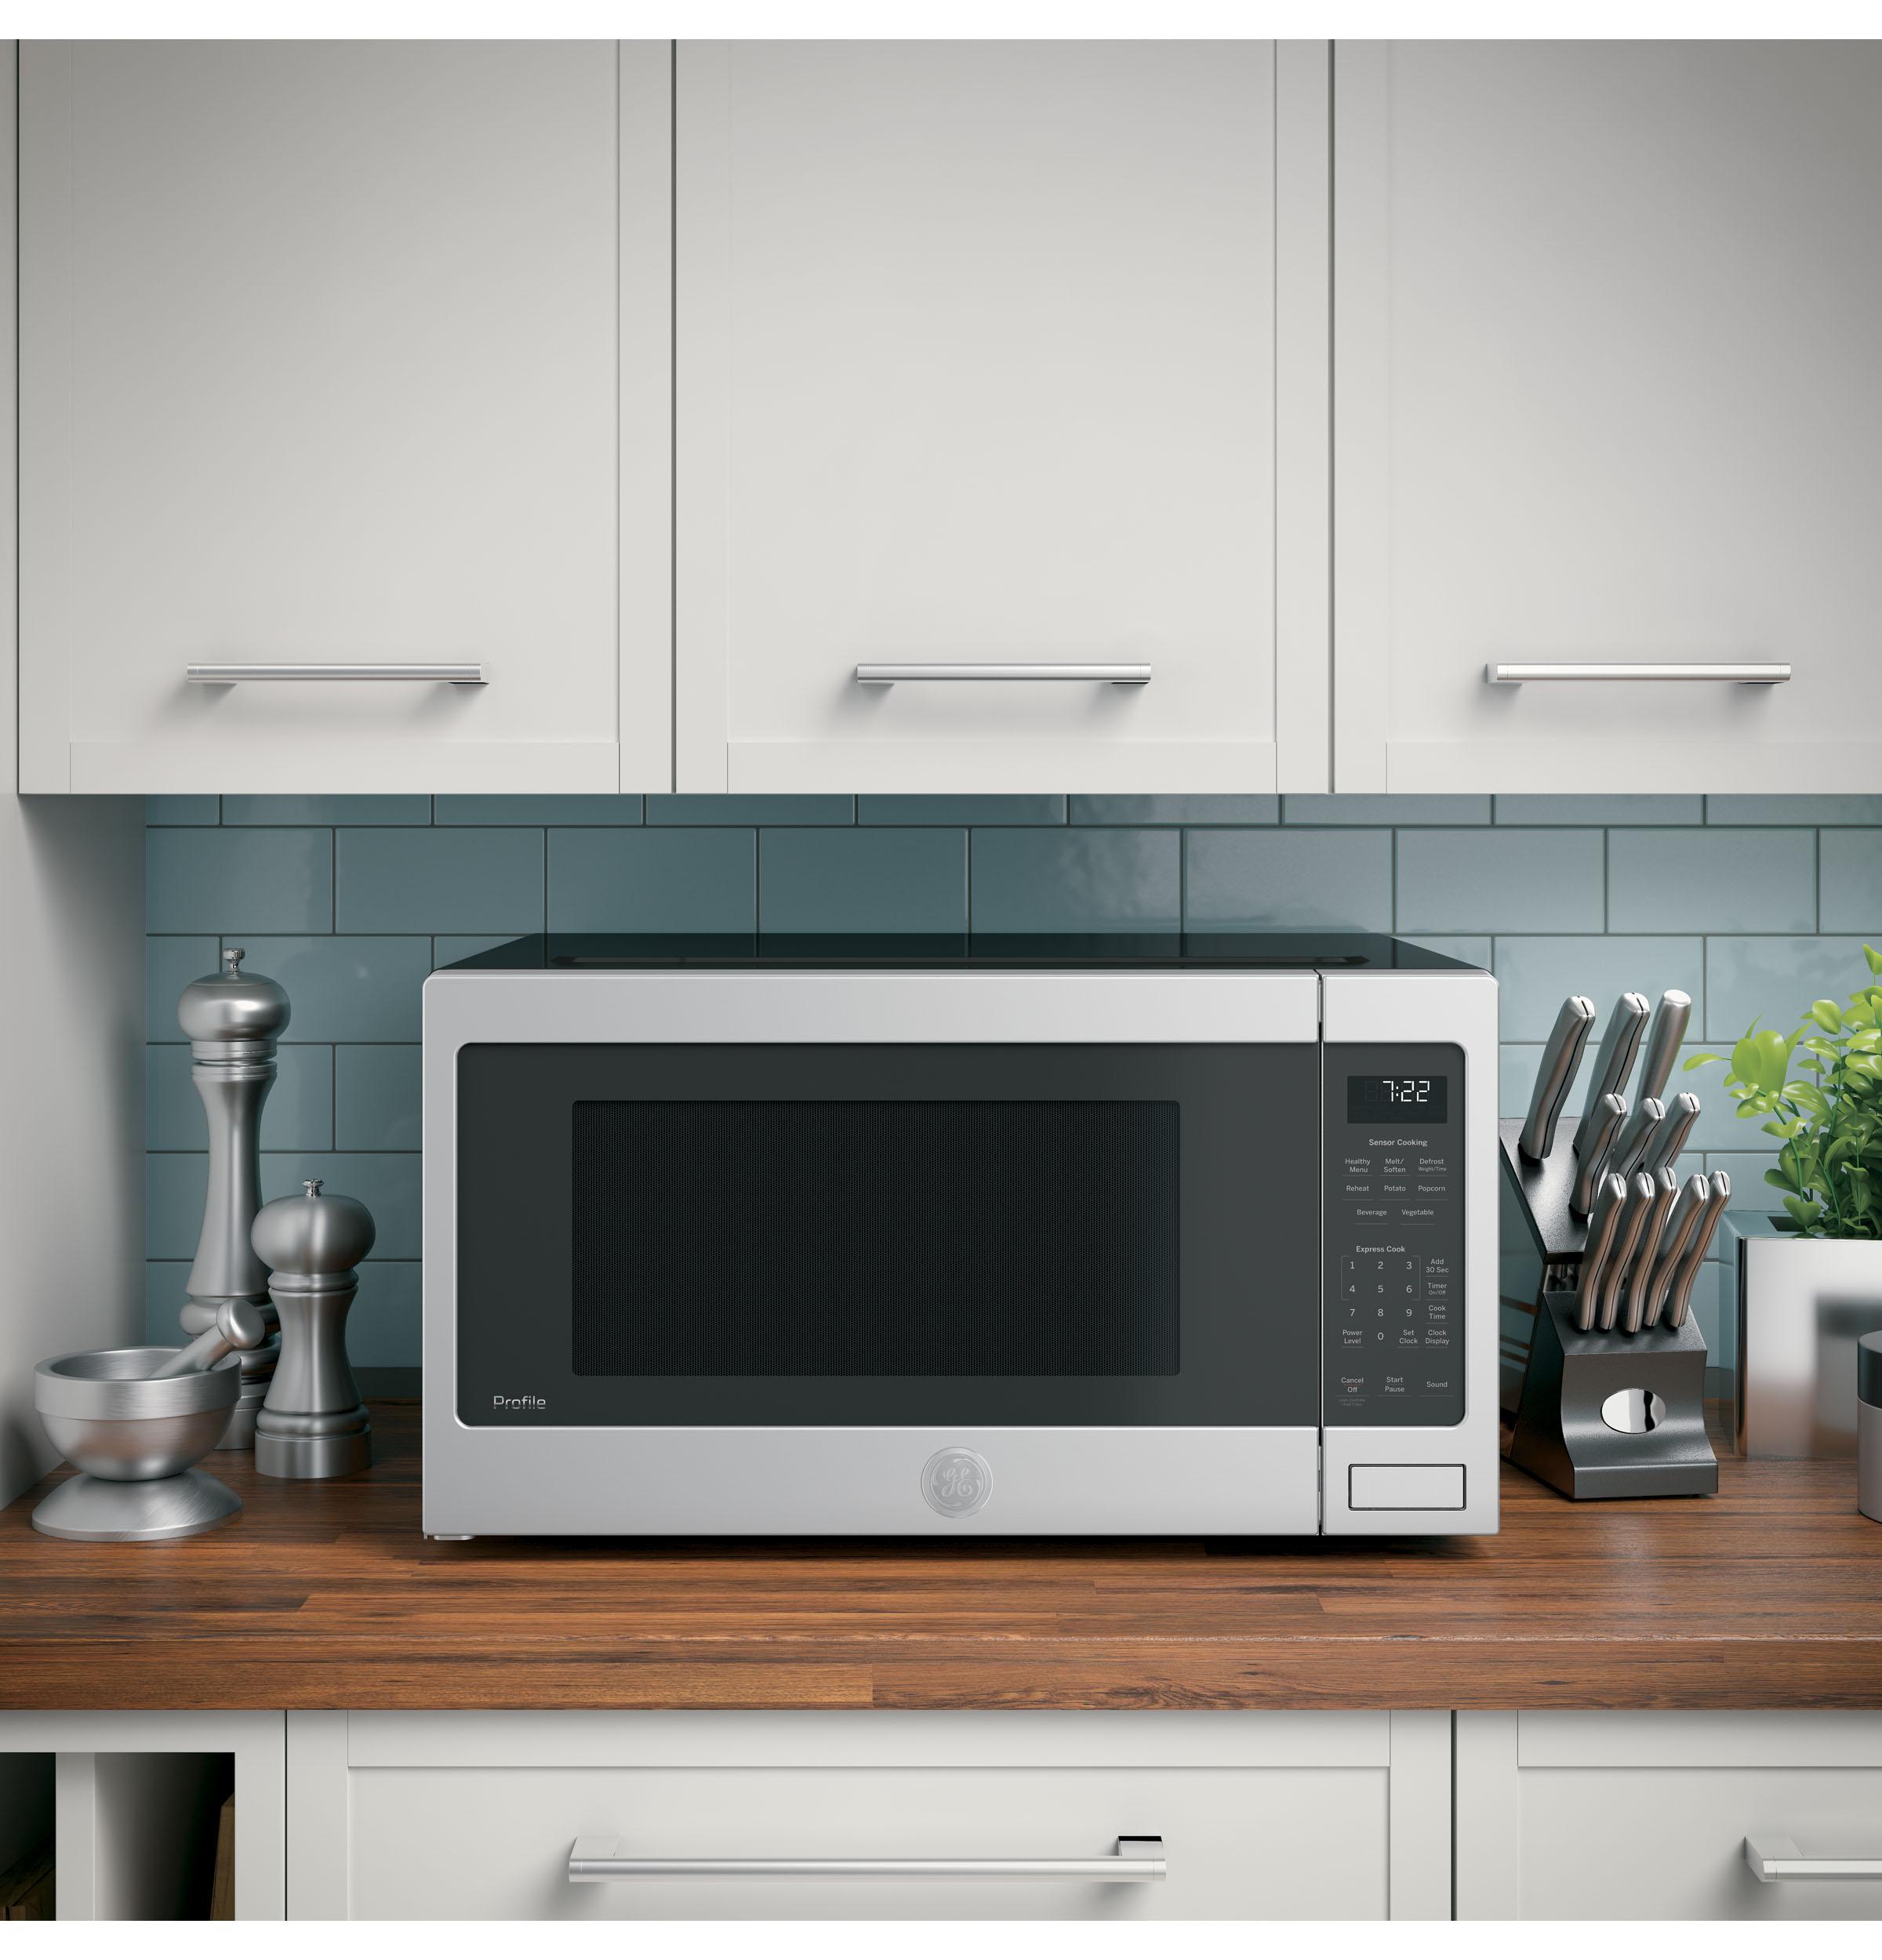 ge profile pes7227slss ge profile series 2 2 cu ft countertop sensor microwave oven pes7227slss daniels discount